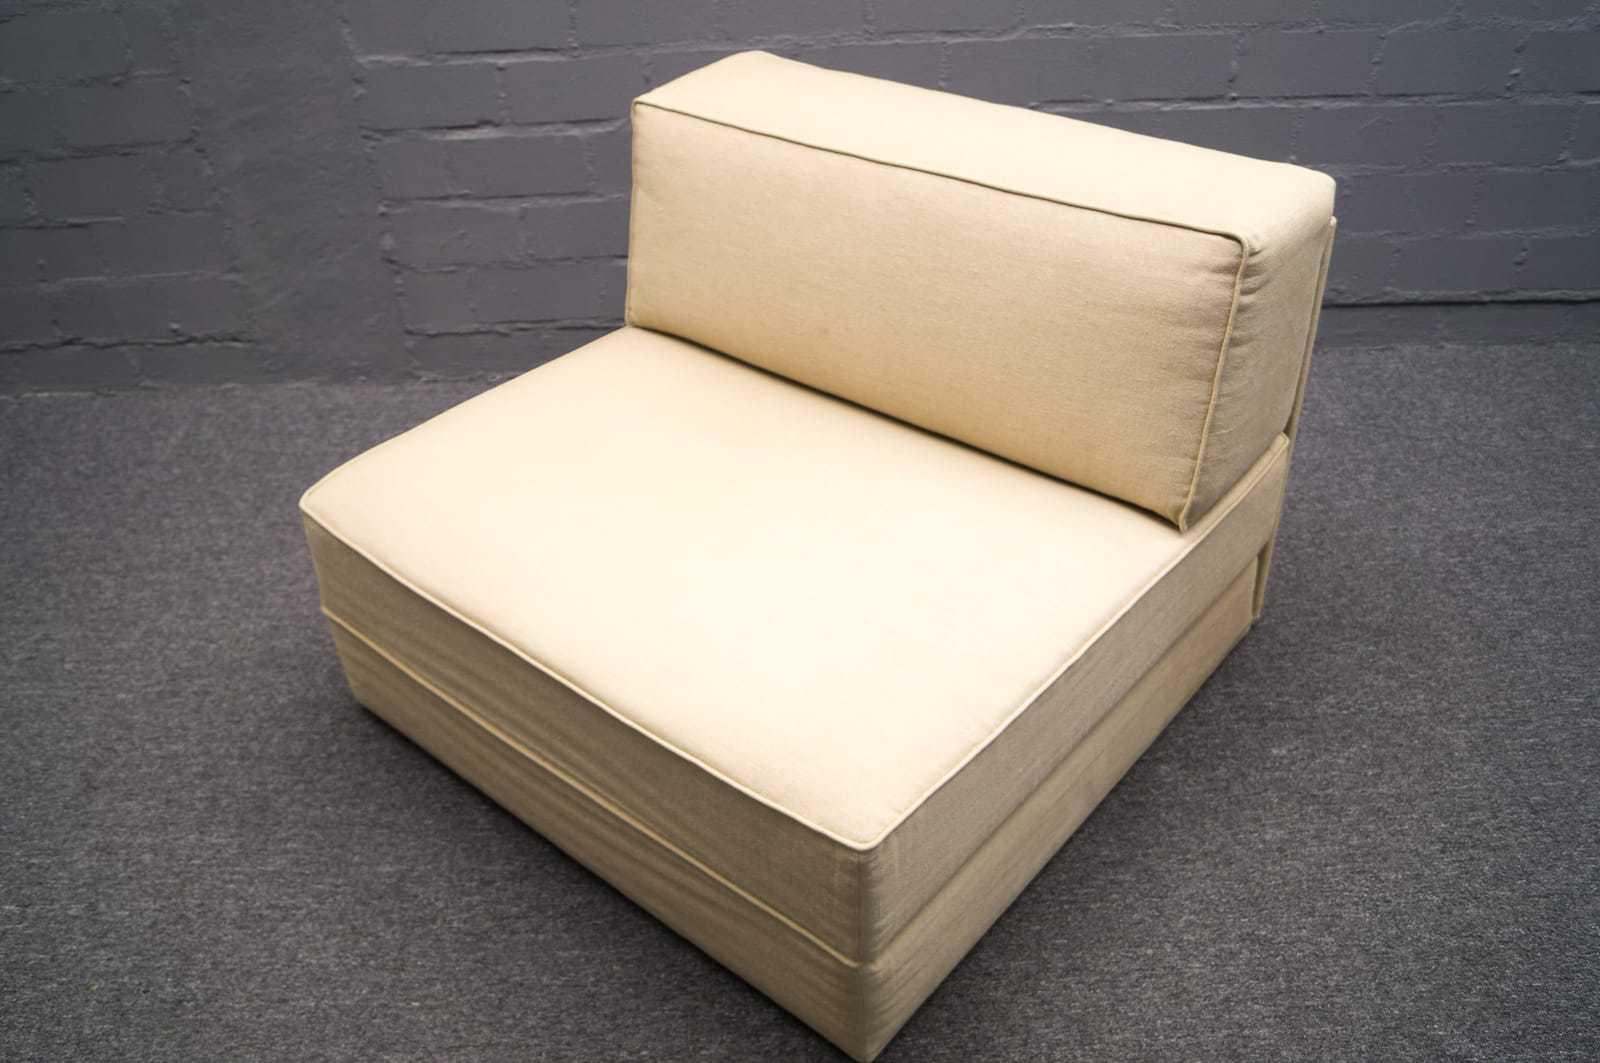 wohnform sessel daybed ausklappbar lounge chair 60er 70er g stebett bett 2v 2 ebay. Black Bedroom Furniture Sets. Home Design Ideas